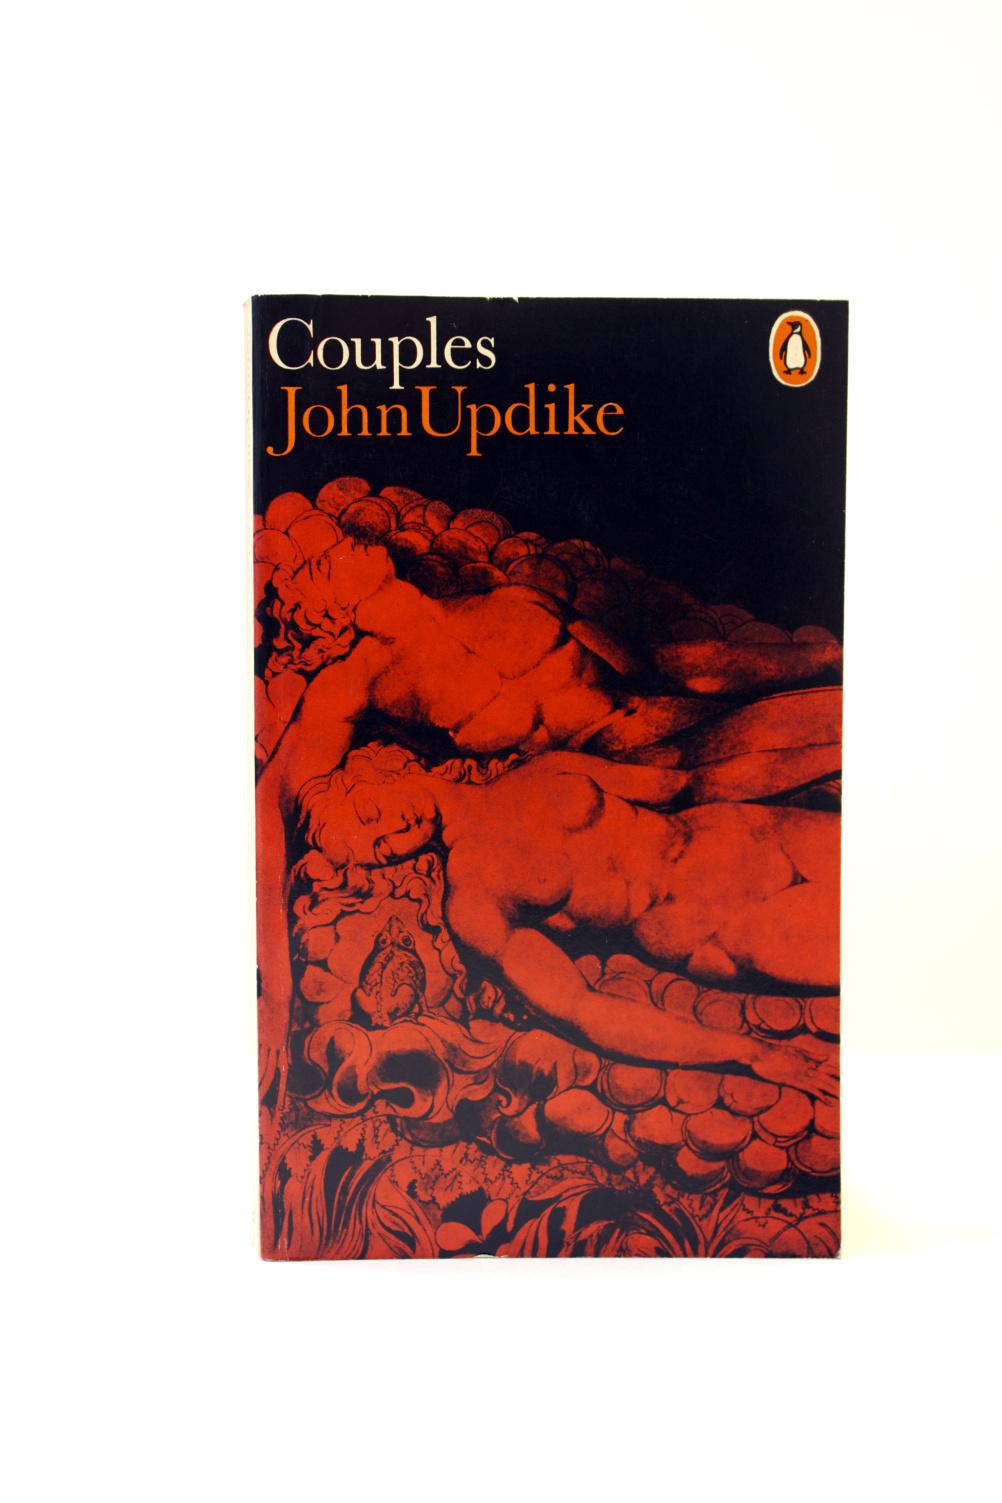 Couples, John Updike